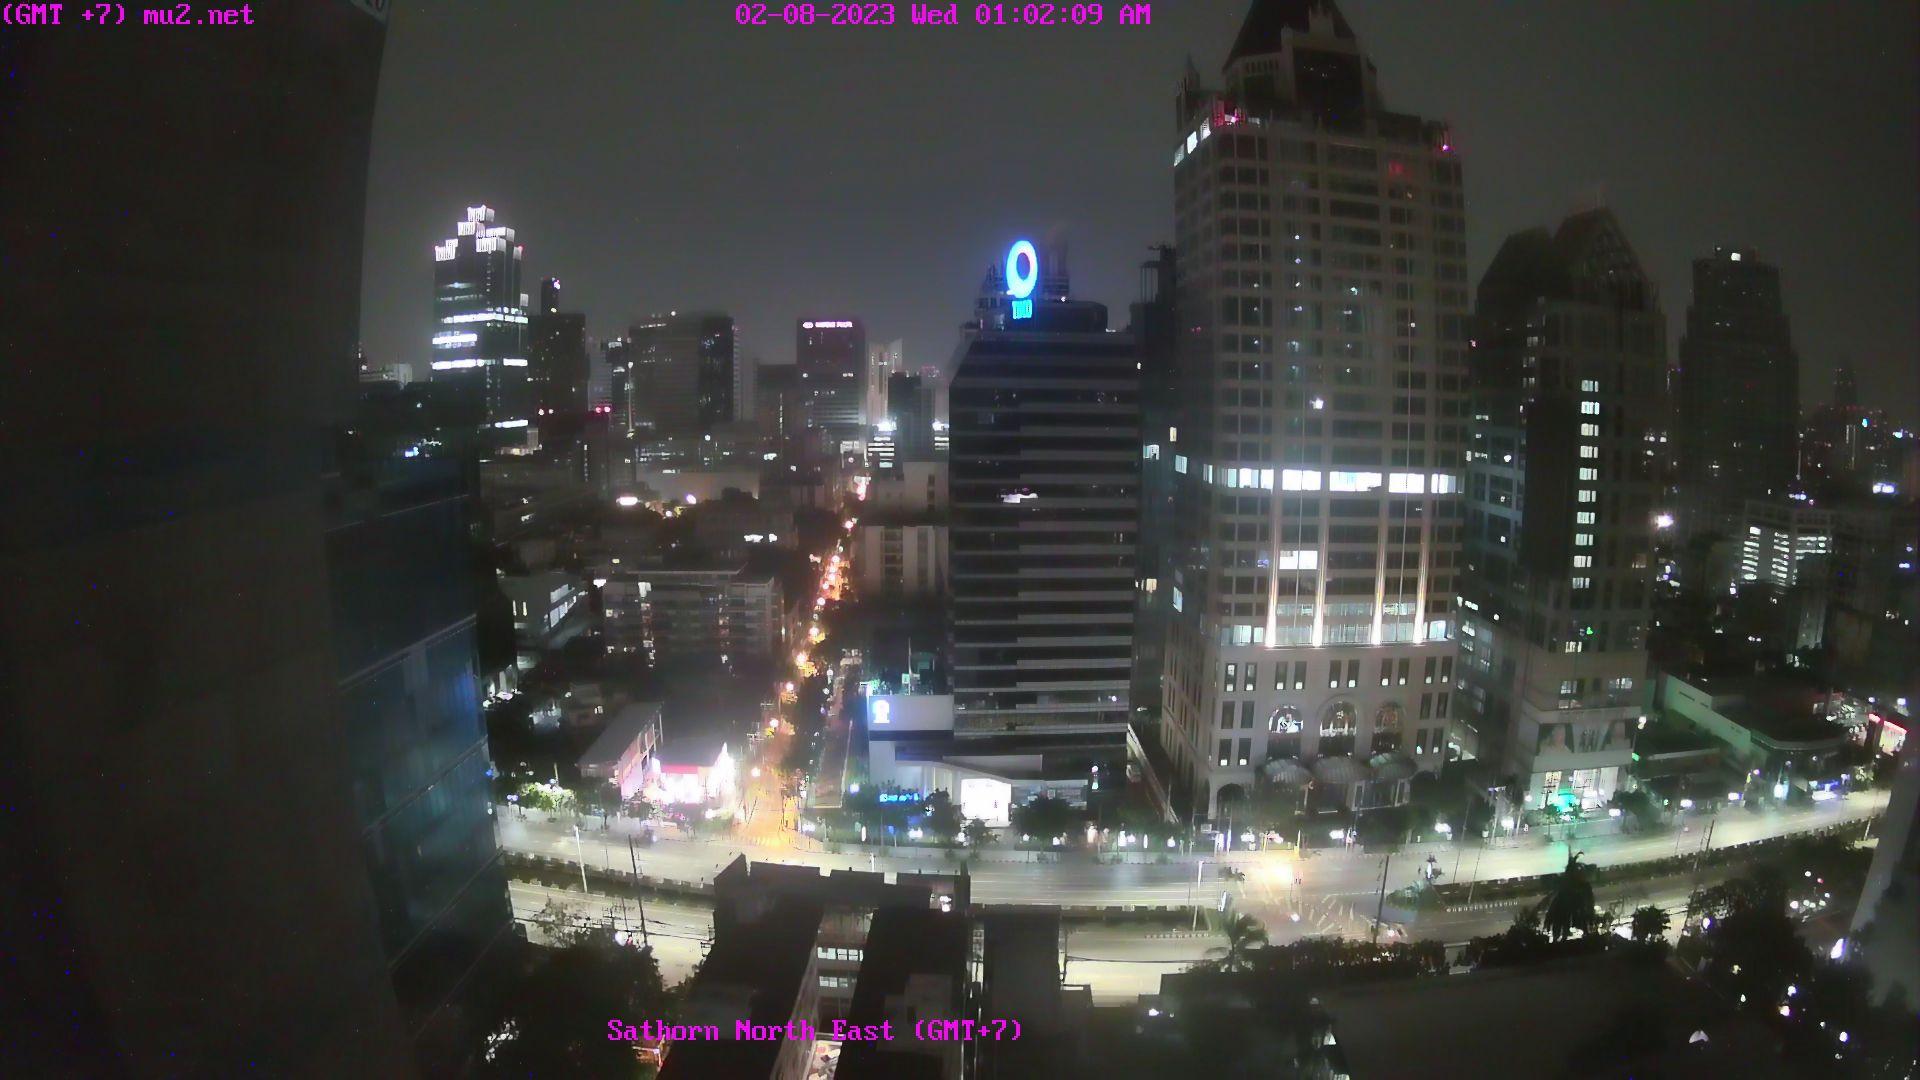 Bangkok Tue. 01:09